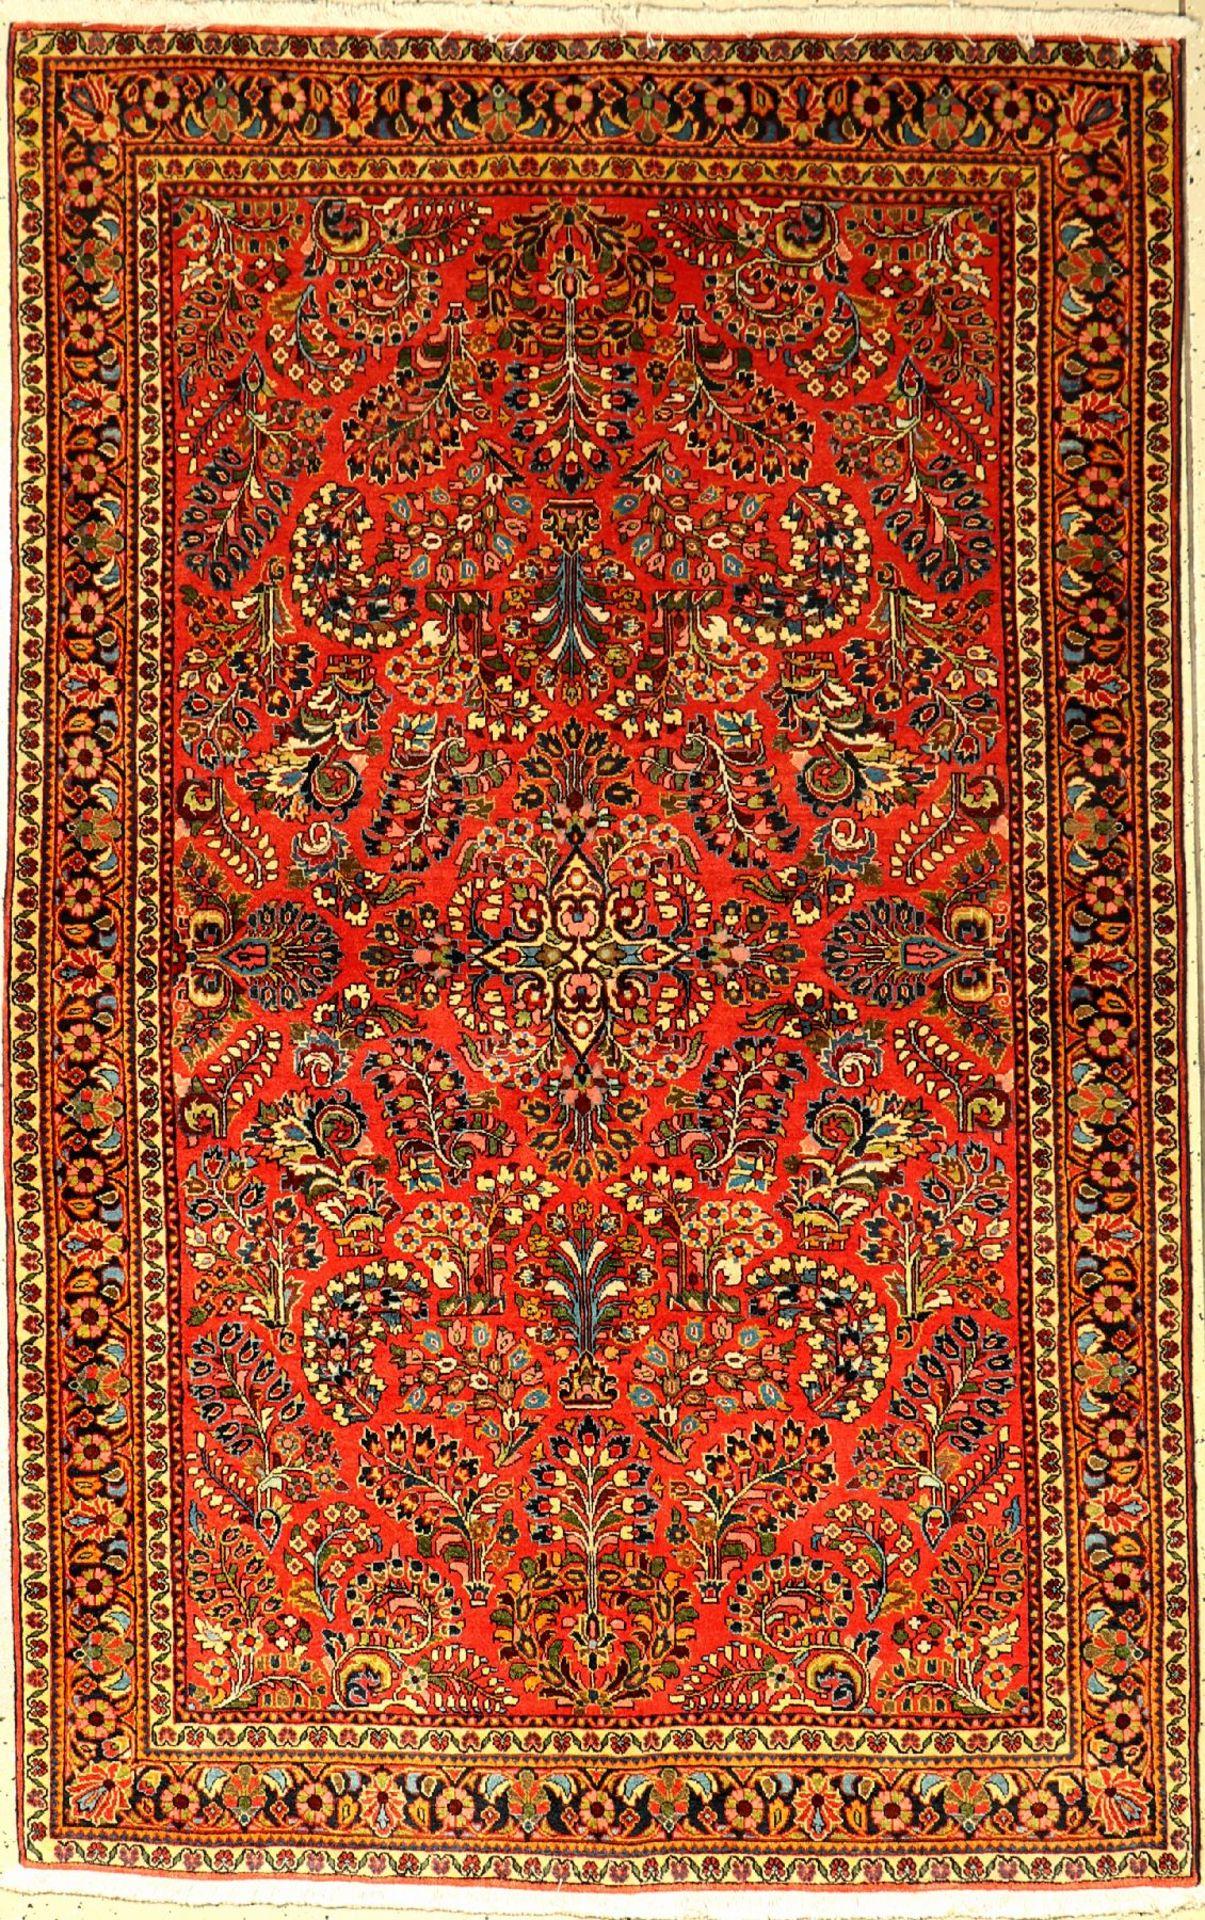 Feiner Sarogh alt, Persien, um 1940/1950, Korkwolle, ca. 205 x 130 cm, Hochwertig, EHZ: 2, (